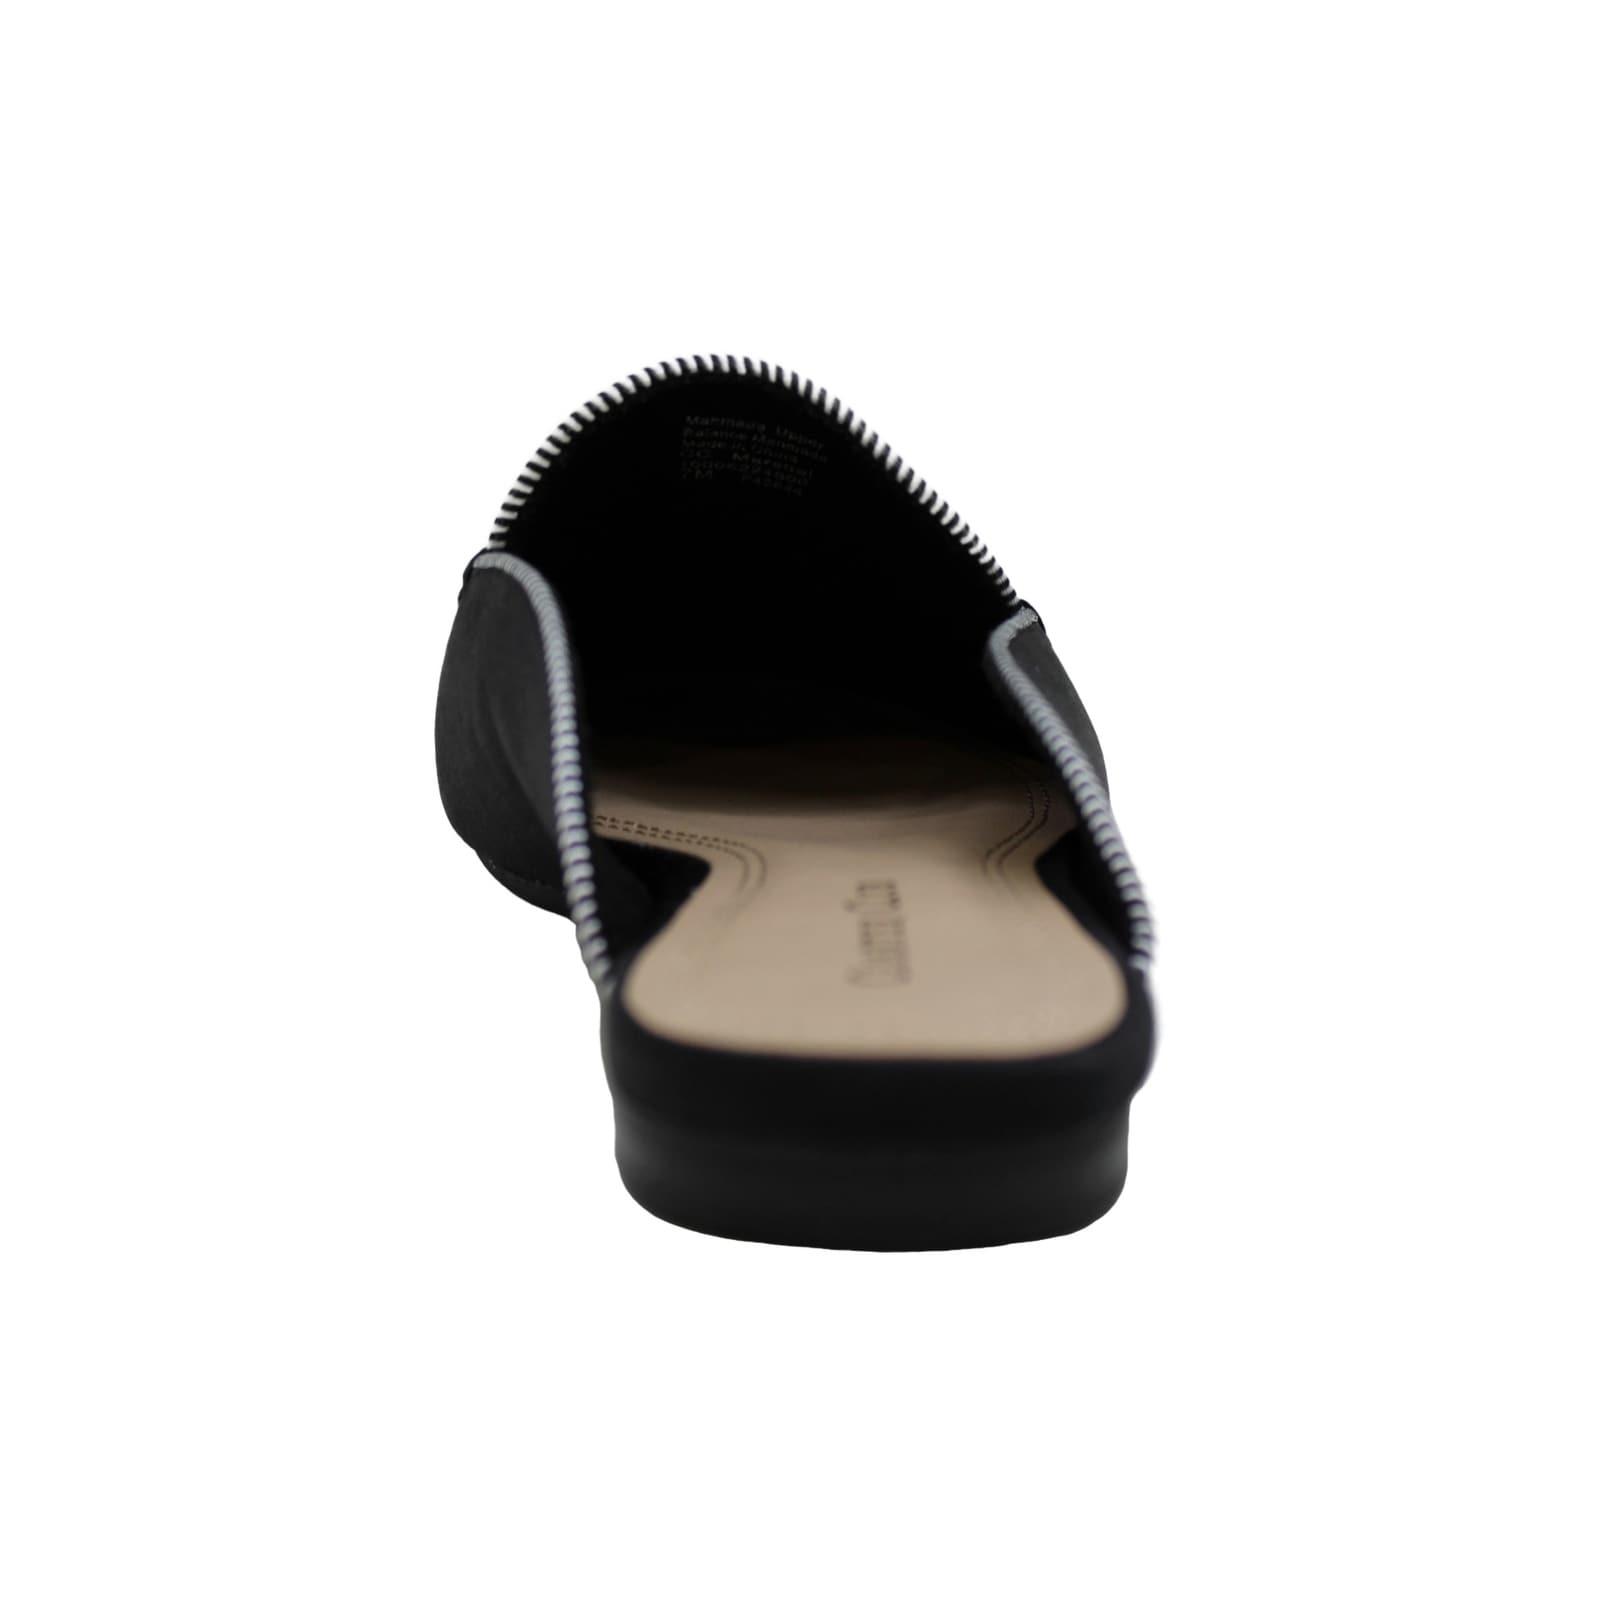 Size 5.0 Black 1 Charter Club Womens marshel Fabric Almond Toe Mules